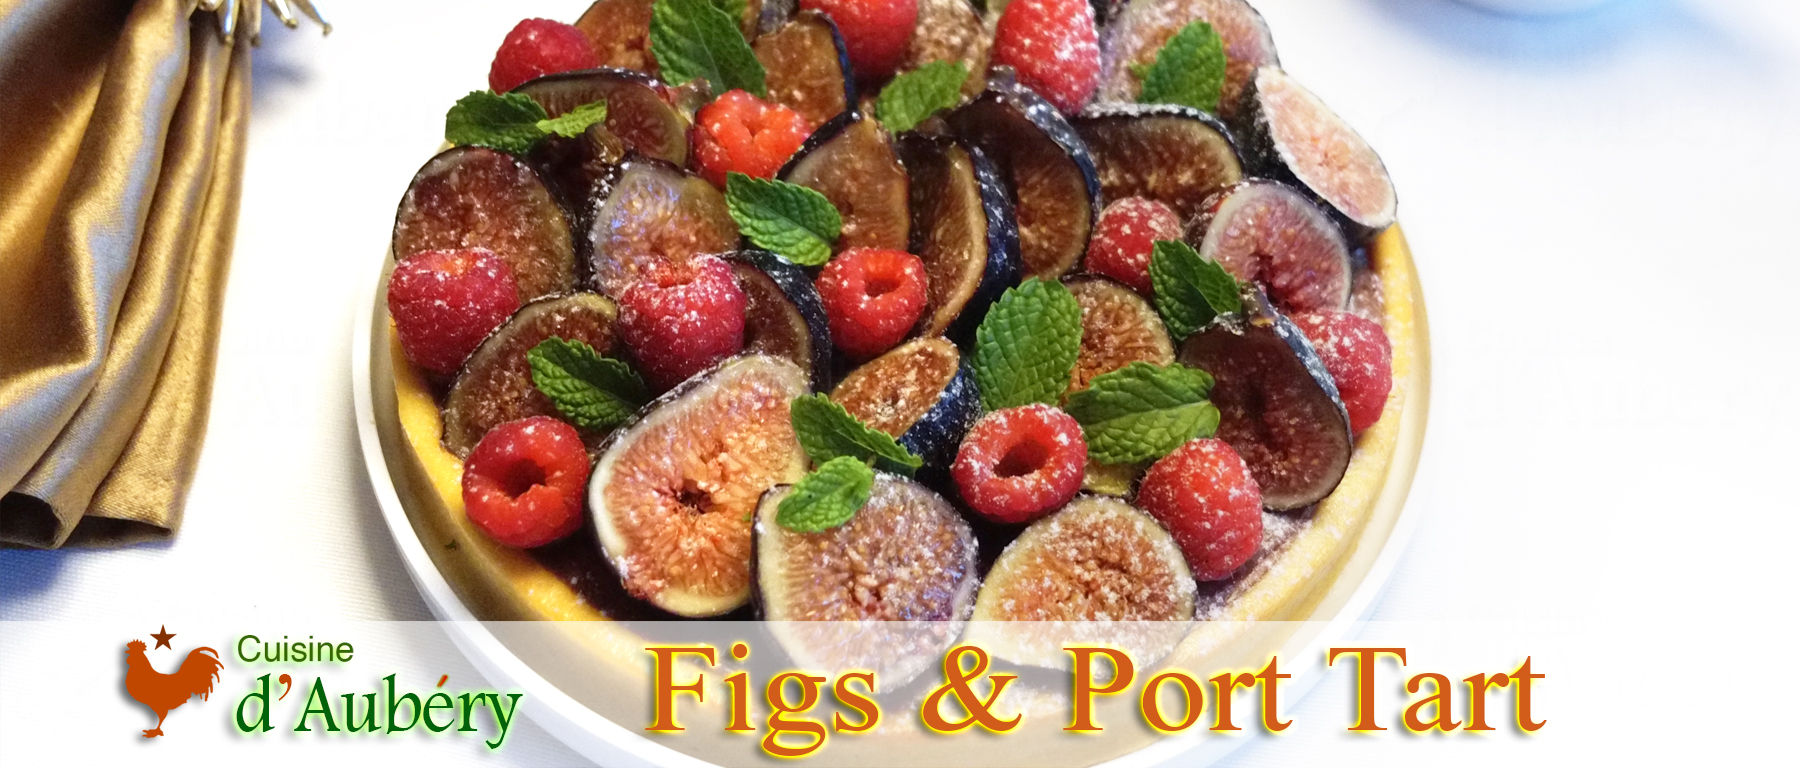 Pierre Hermé's Fig, Raspberries and Port Tart